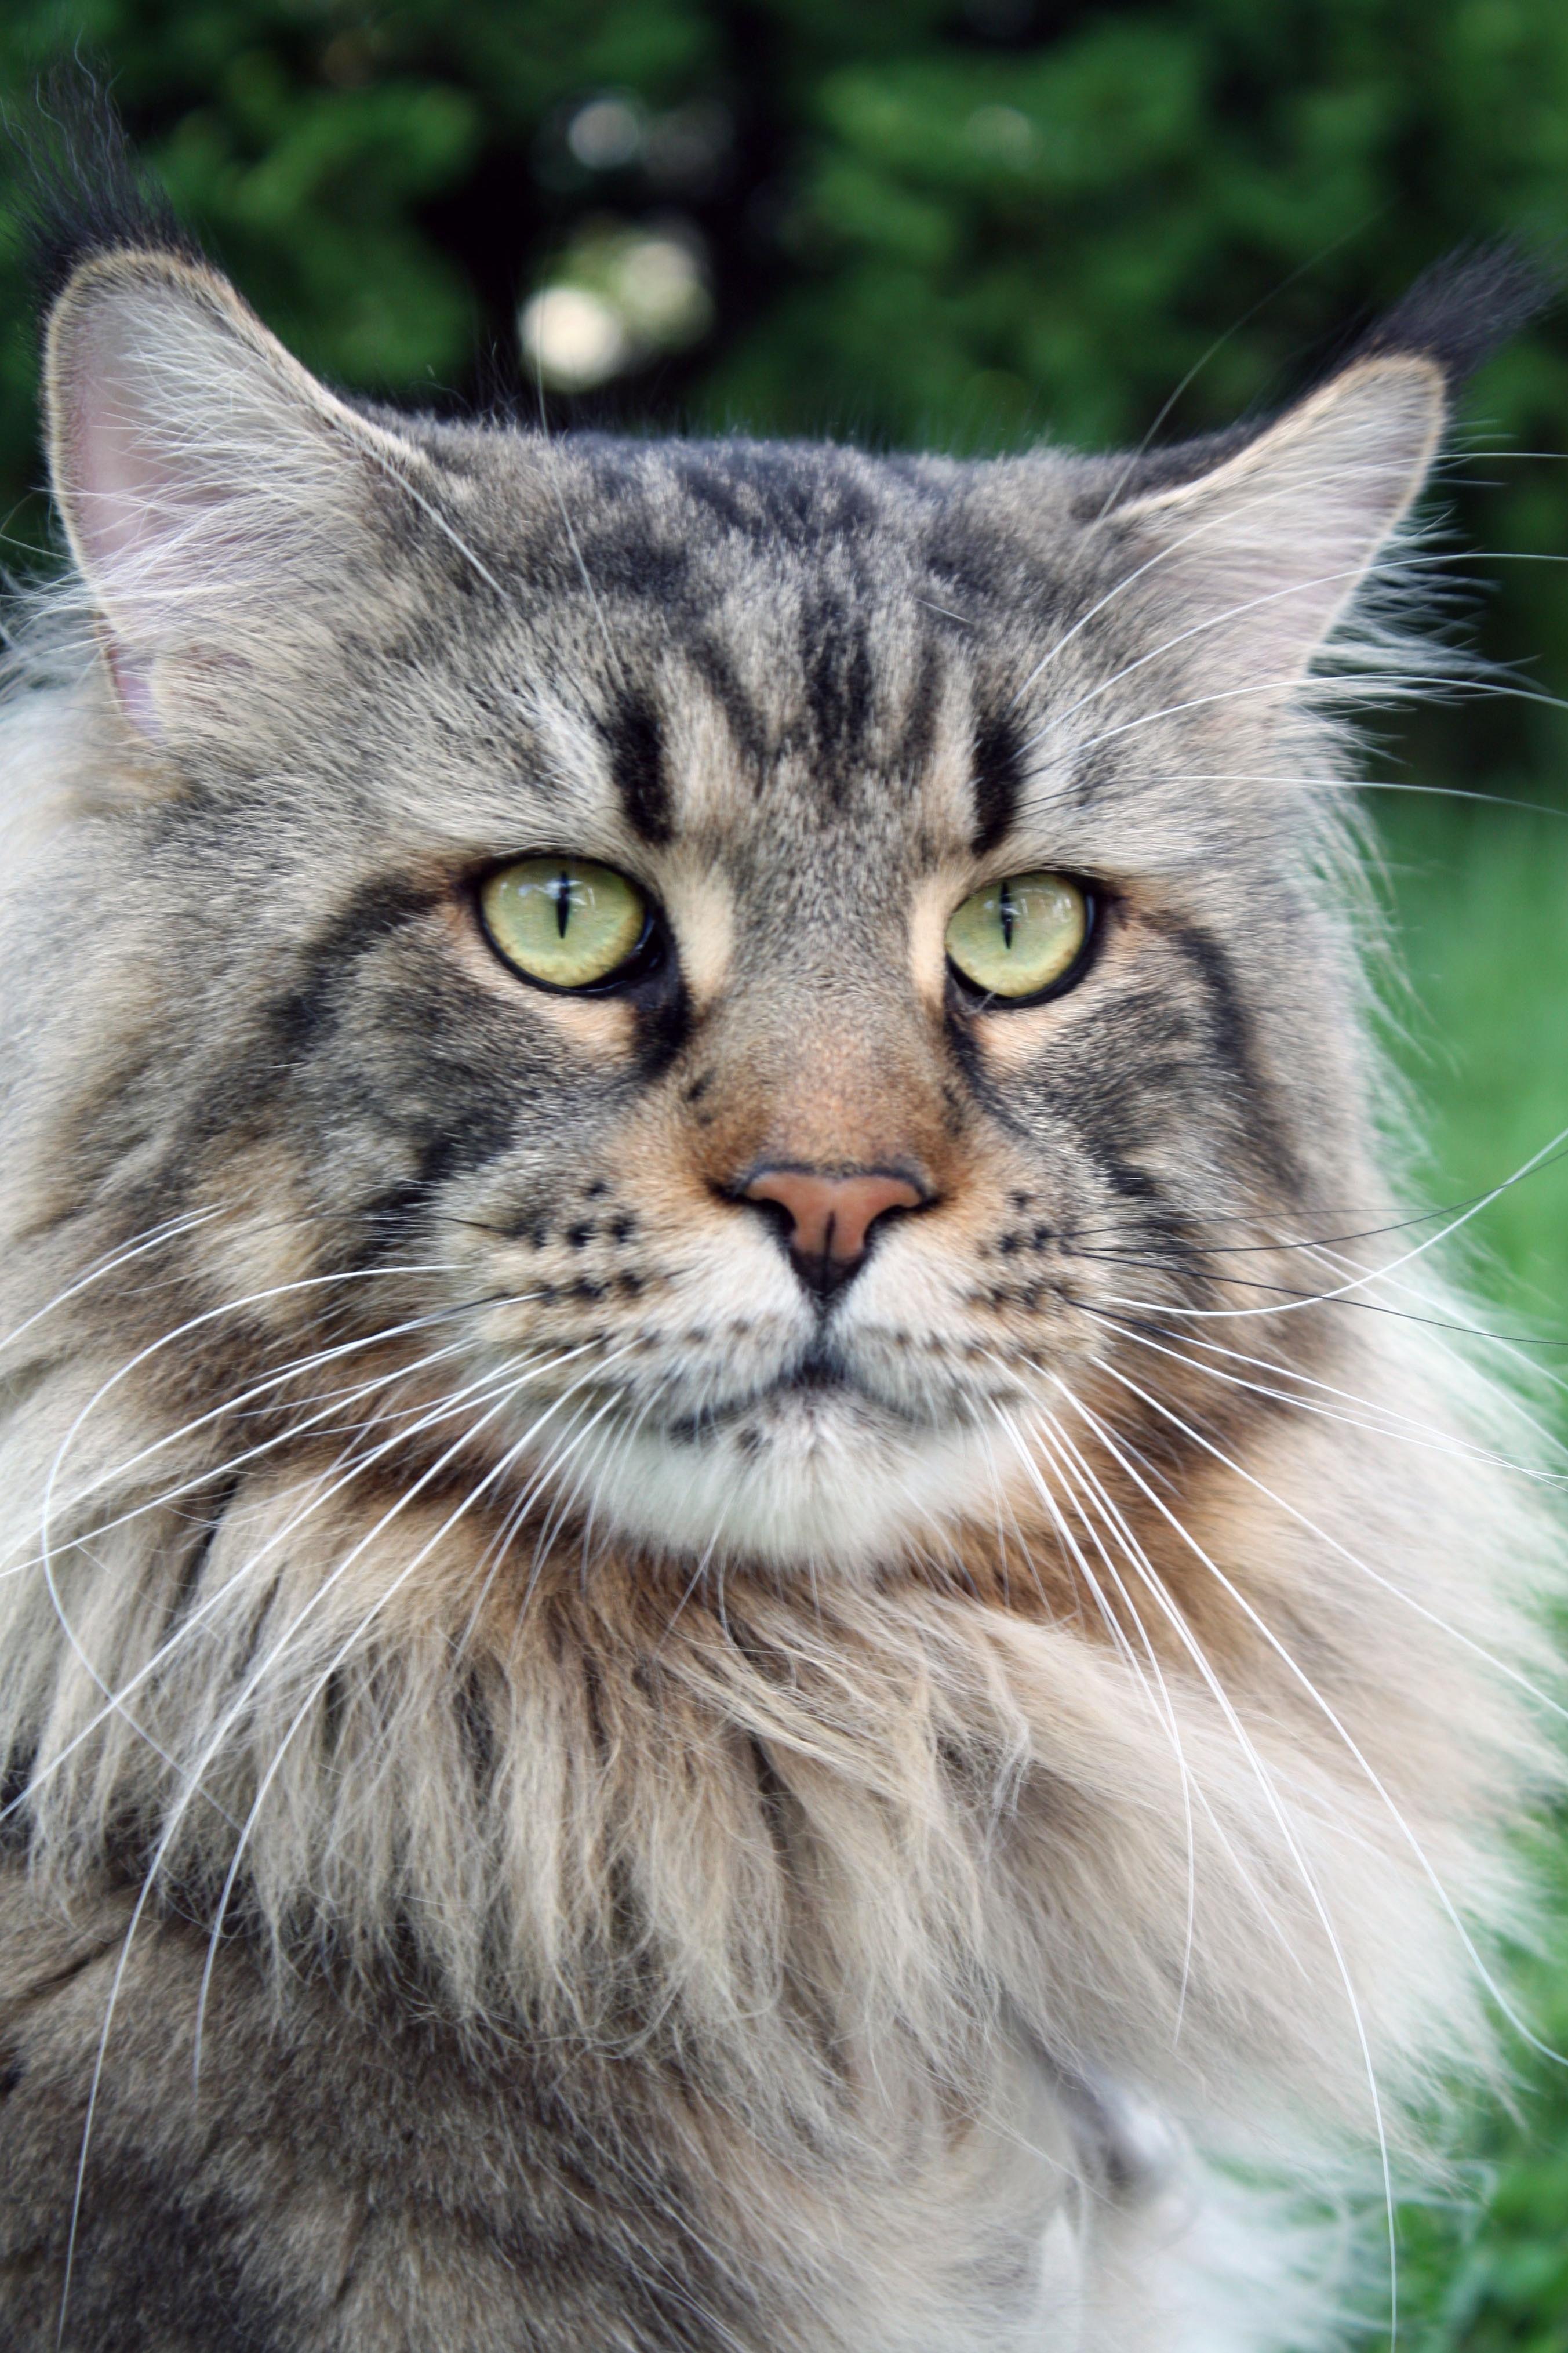 Free picture: cat, animal, portrait, cute, pet, head, gray ...